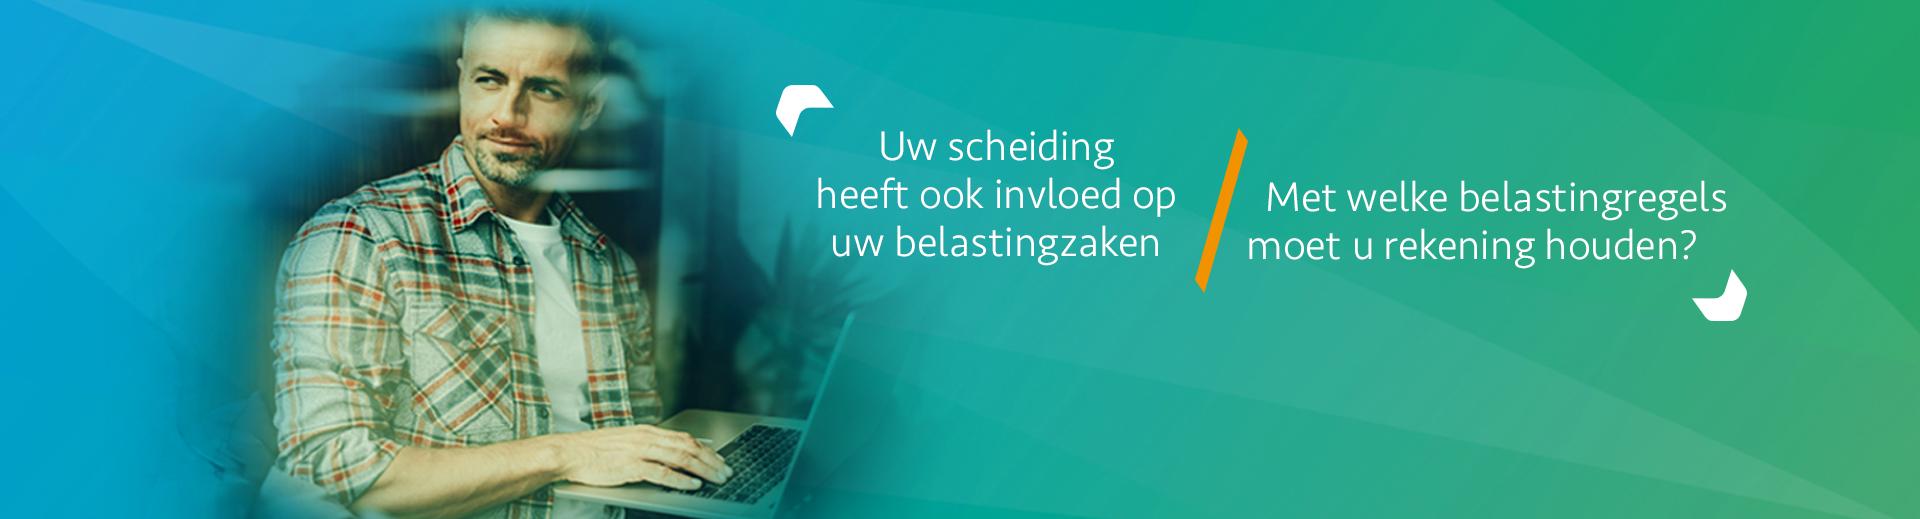 Belasting en echtscheiding - Scheidingsplanner Midden-Nederland